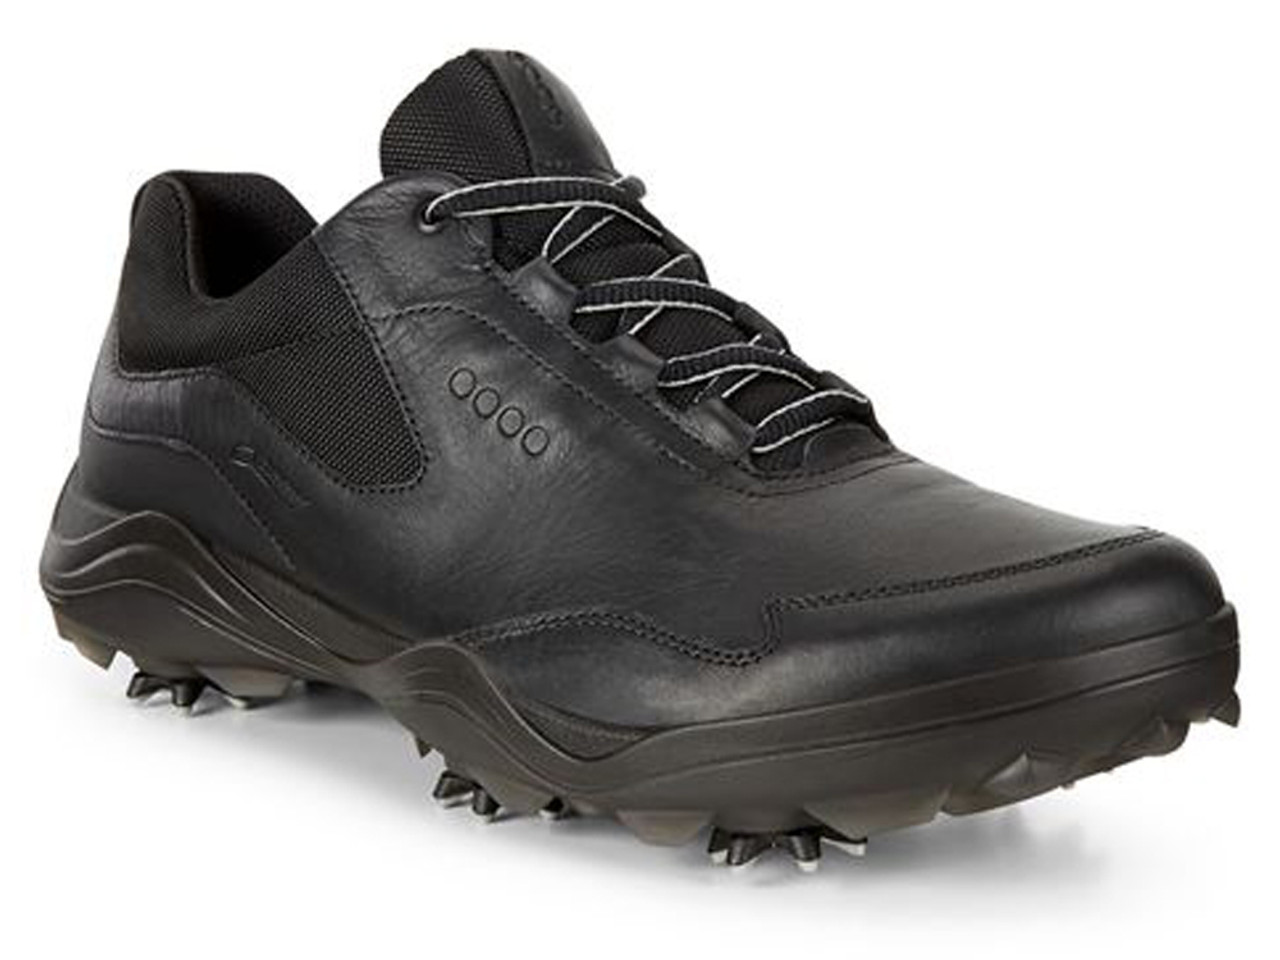 Ecco Strike Golf Shoes Black